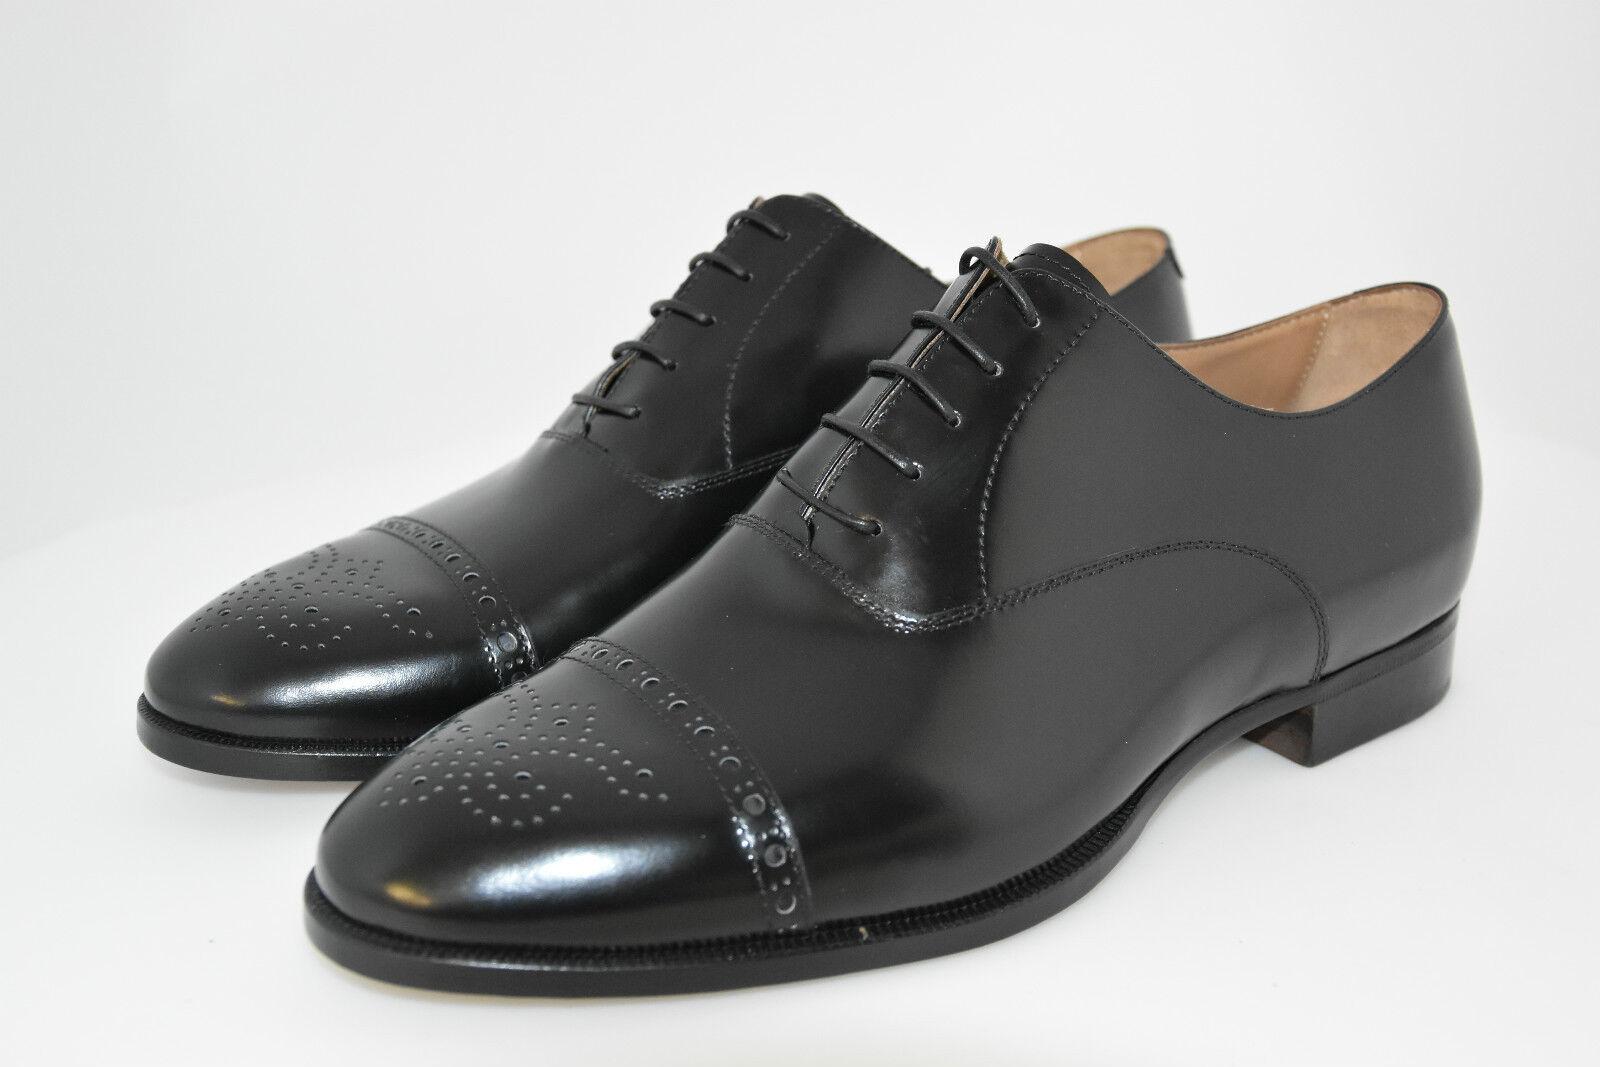 MAN-8½EU-9½US-OXFORD CAPTOE-noir CALF-VITELLO noir-LEATHER SOLE